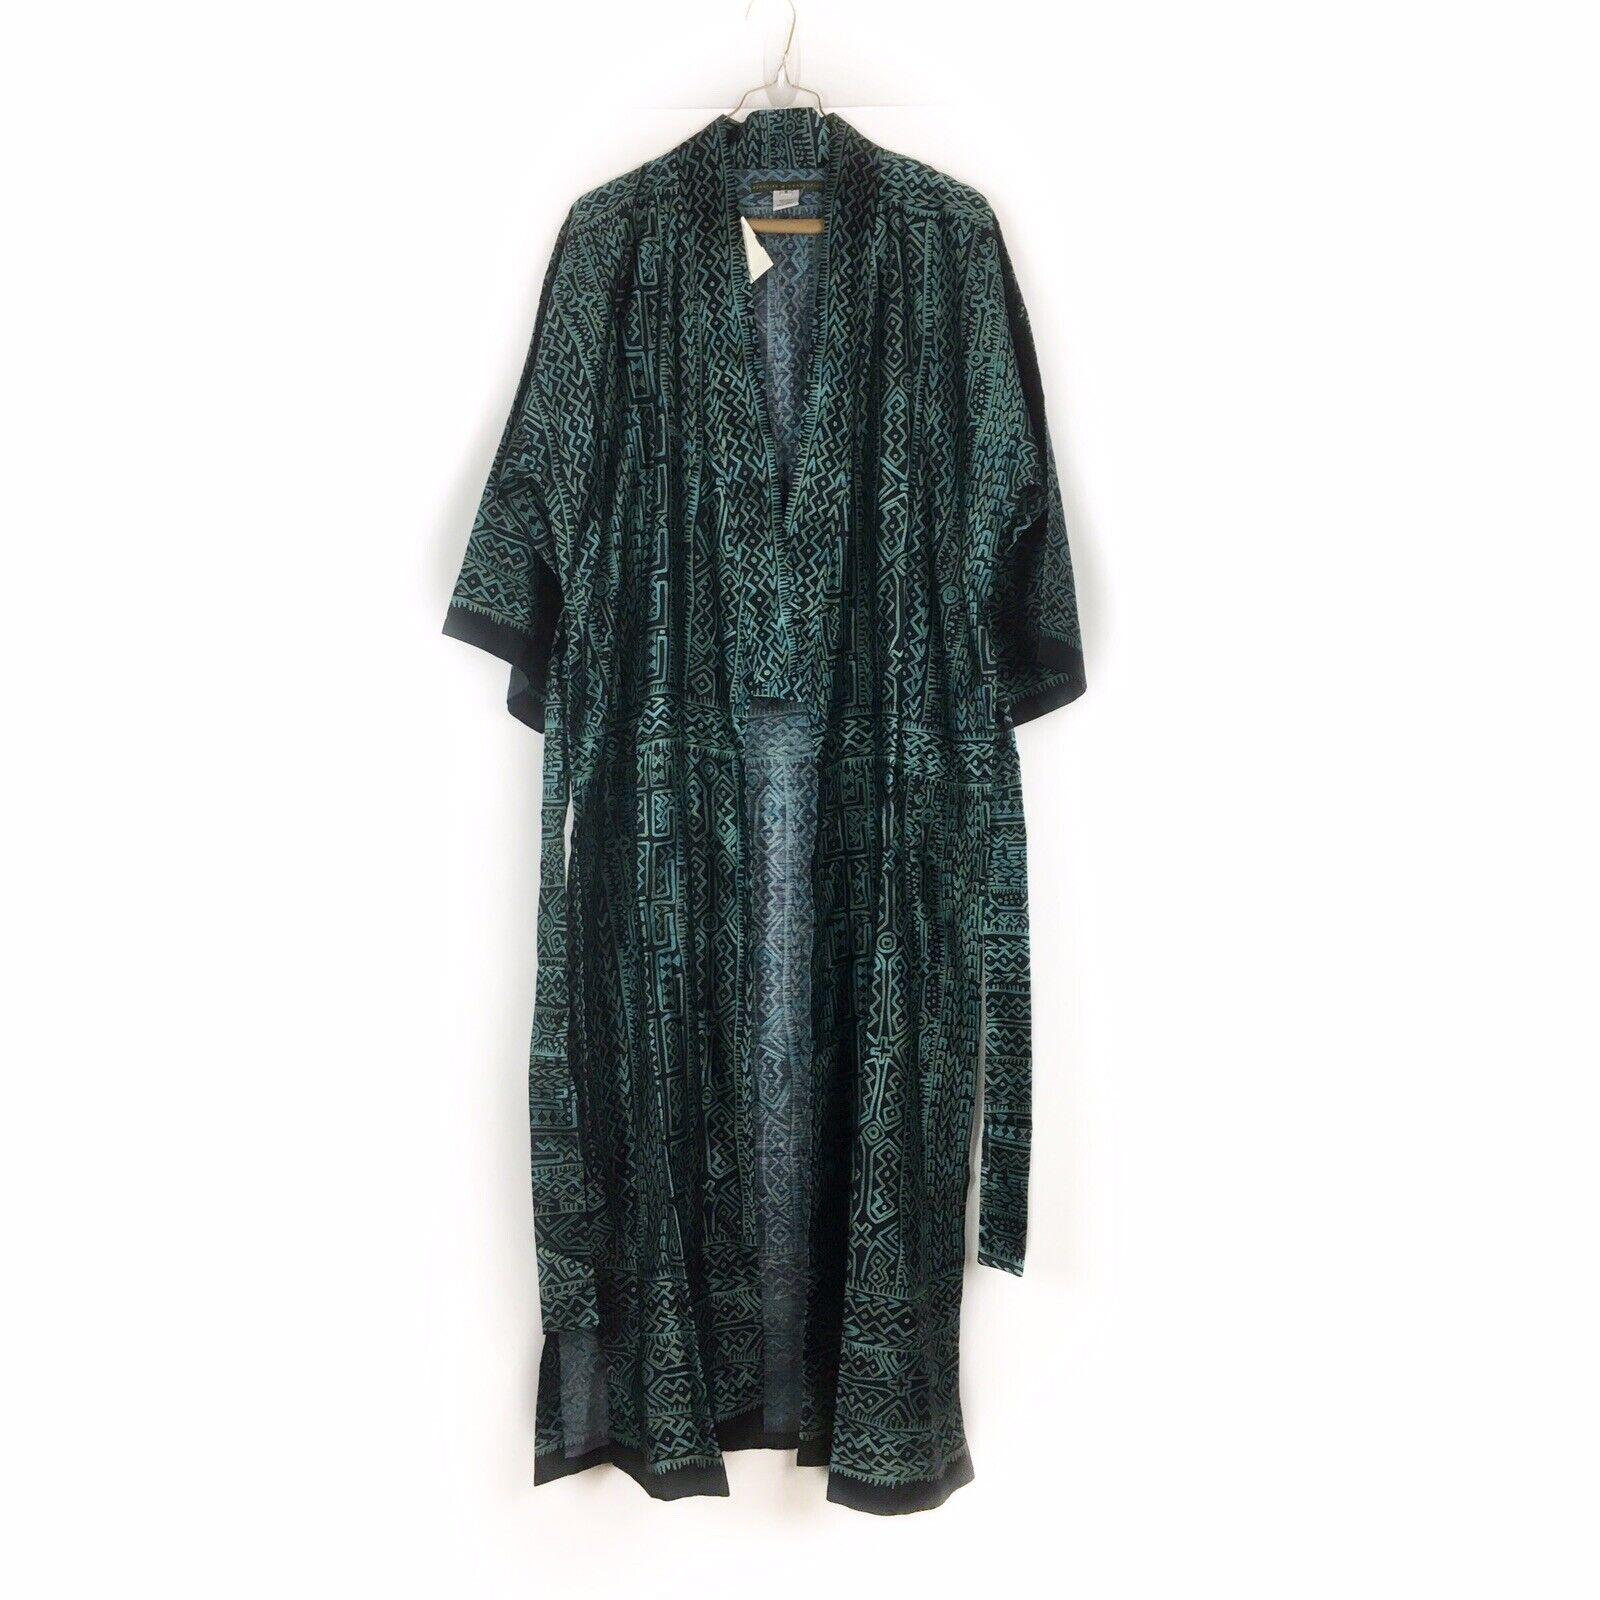 Peruvian Connection Sz S Long Kimono Duster Cardigan Maxi 100% Cotton Grün NEW